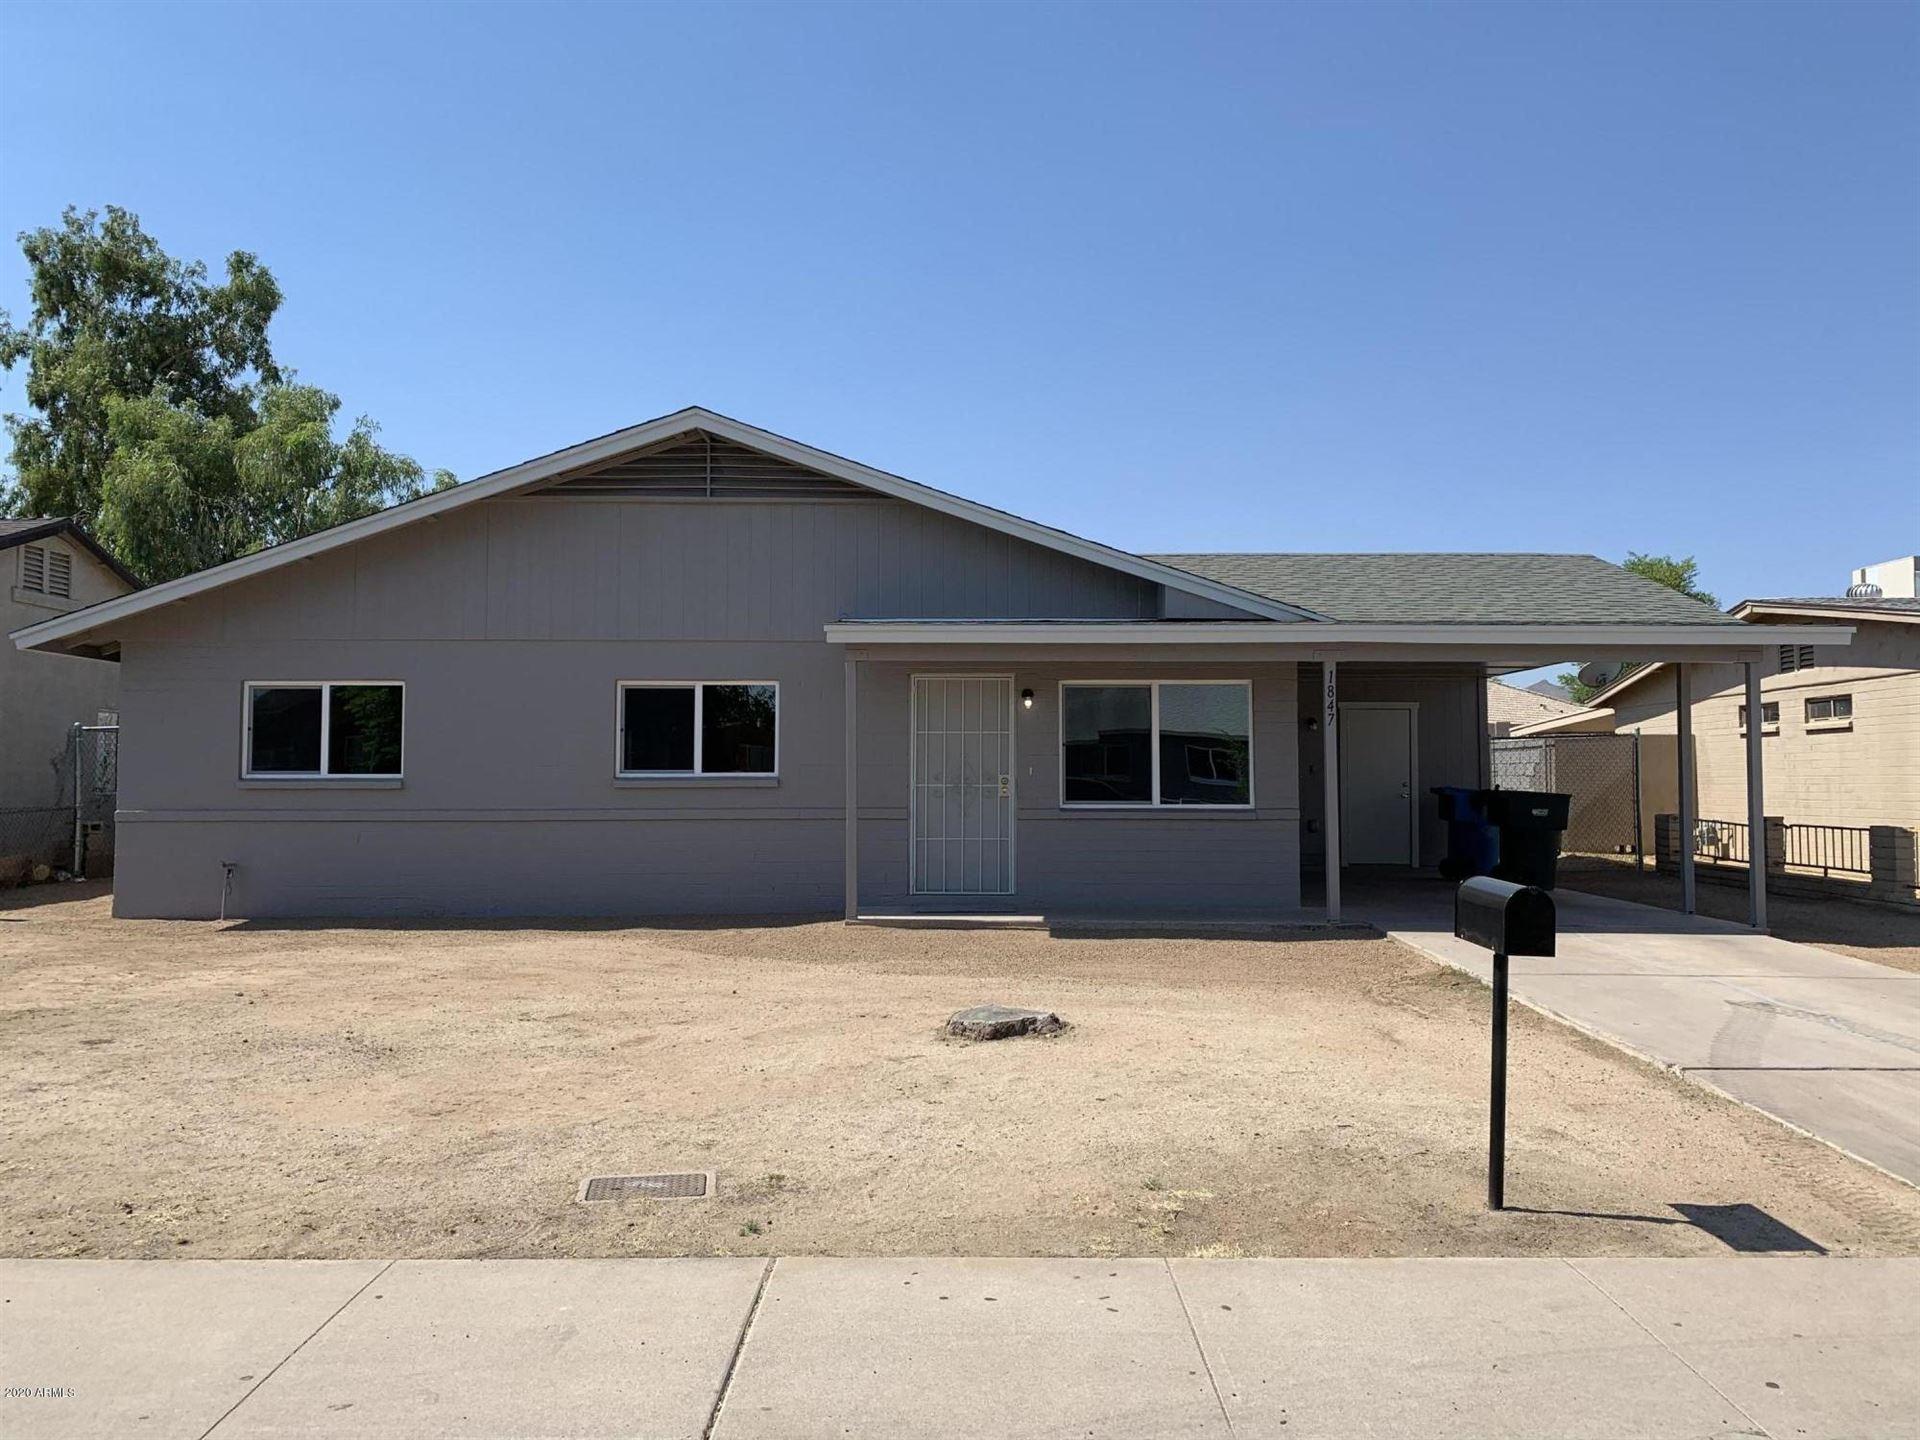 1847 W ALTA VISTA Road, Phoenix, AZ 85041 - MLS#: 6095071